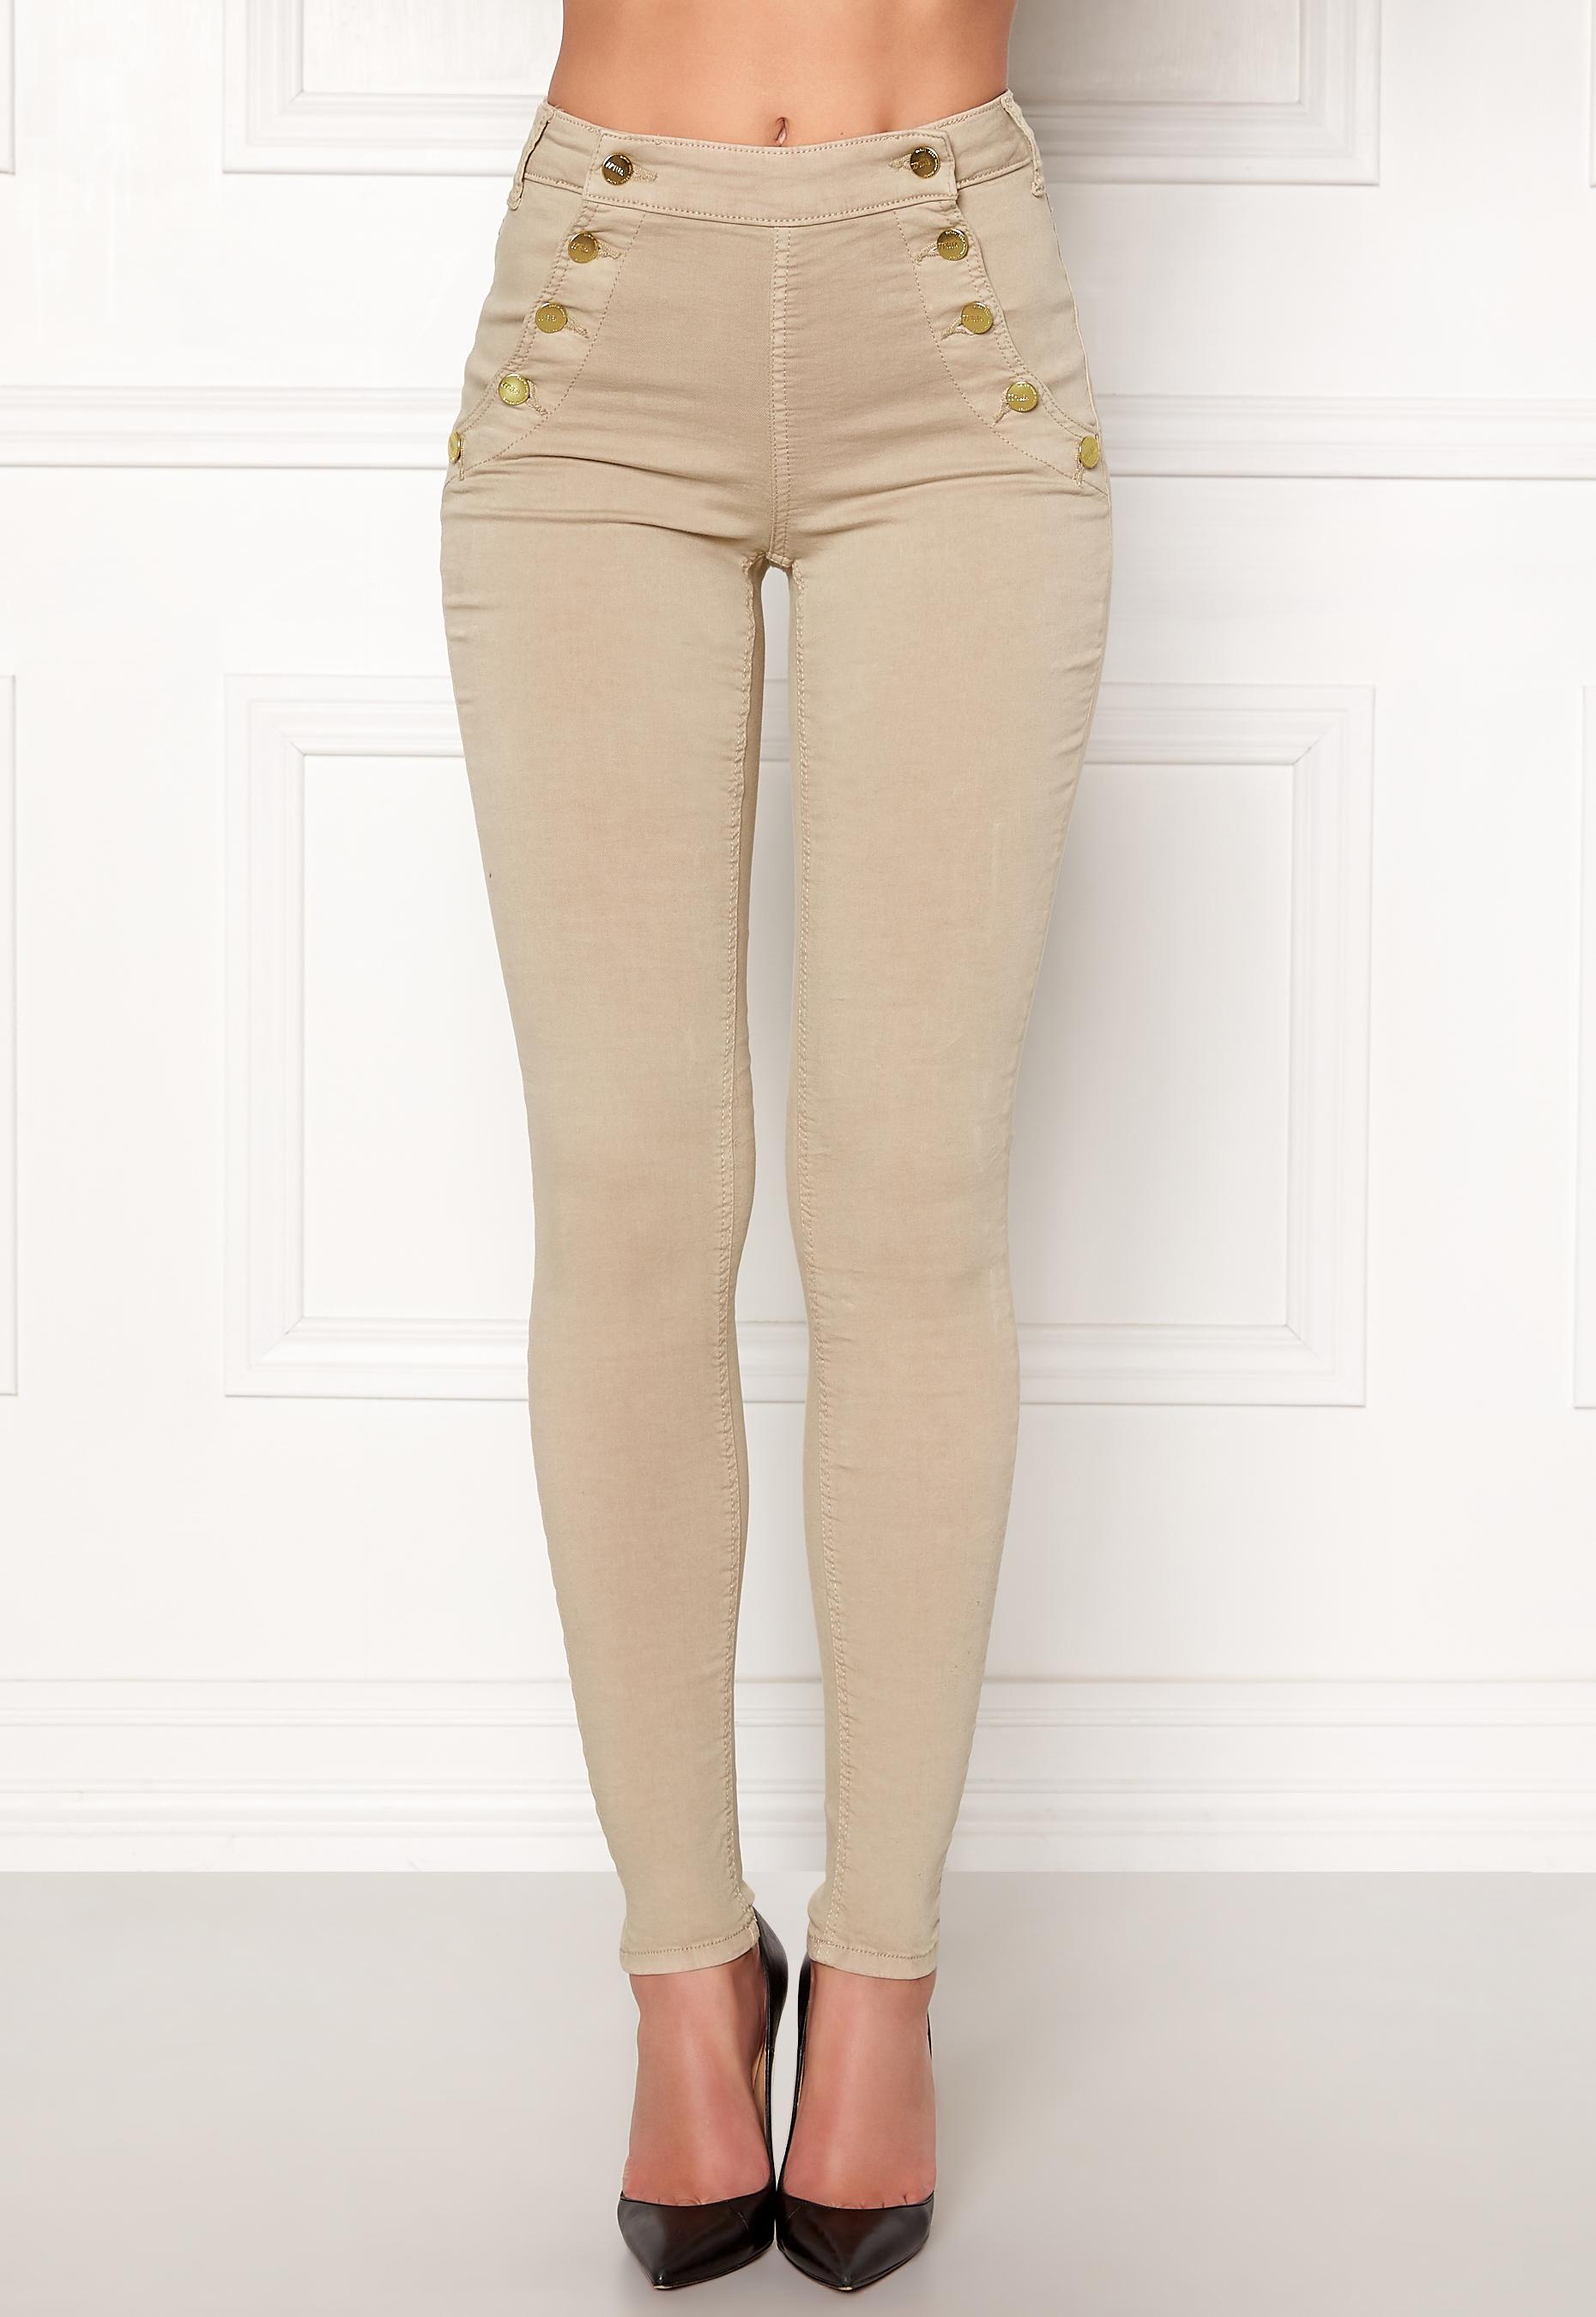 77thFLEA Adina highwaist jeans Putty - Bubbleroom 6a6277482c283